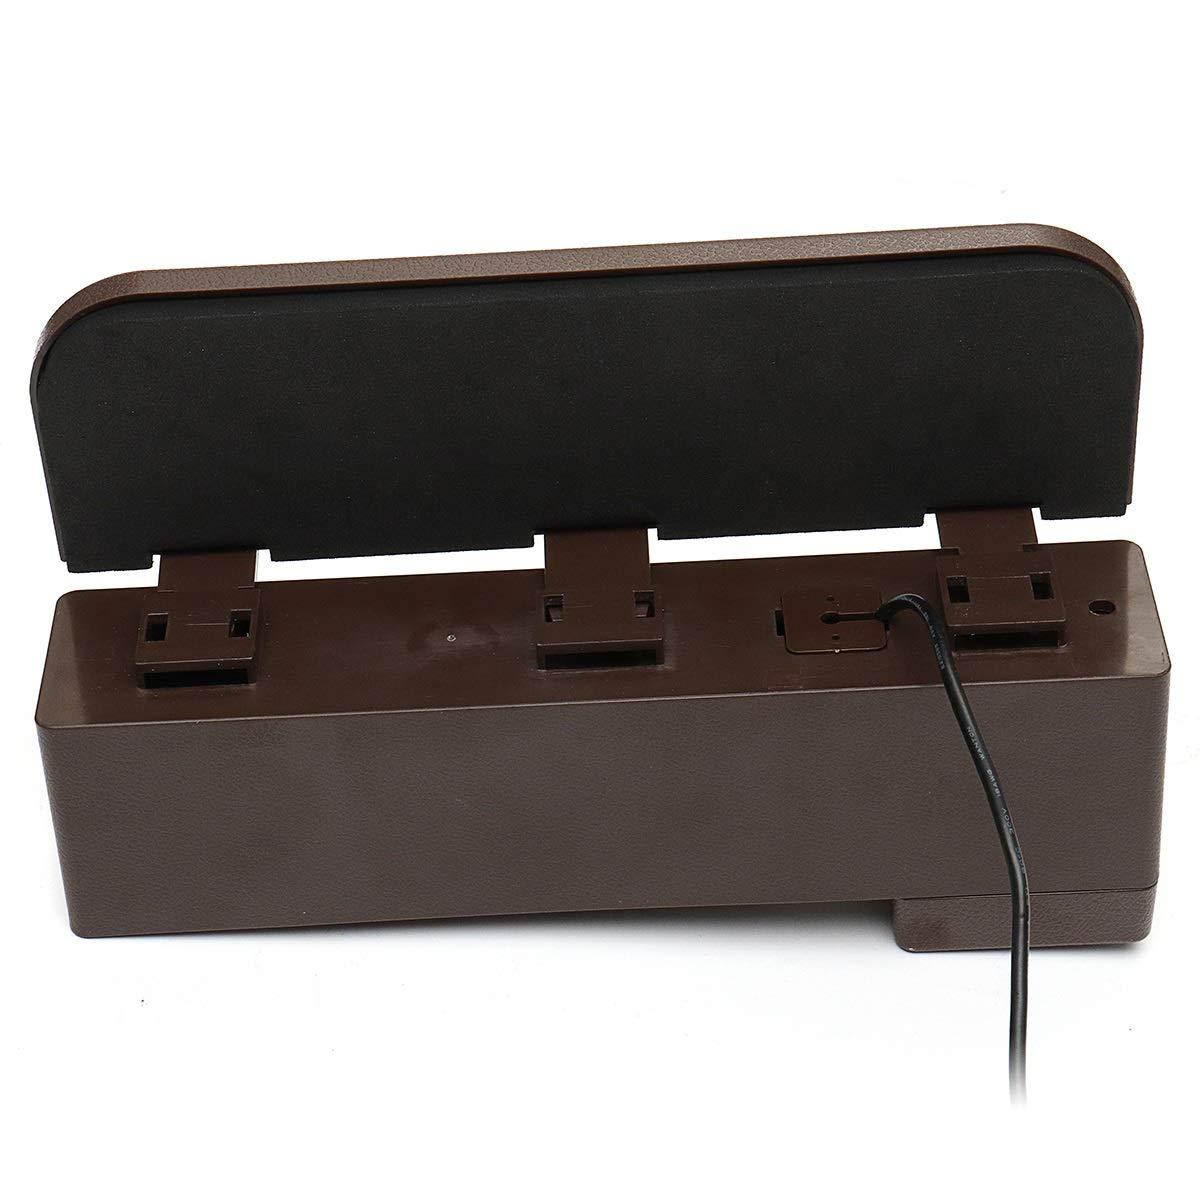 ZHENWOCAI Plastic Car Seat Crevice Storage Box Gap Organizer with Phone USB Wireless Charging New (Color : Off-white)